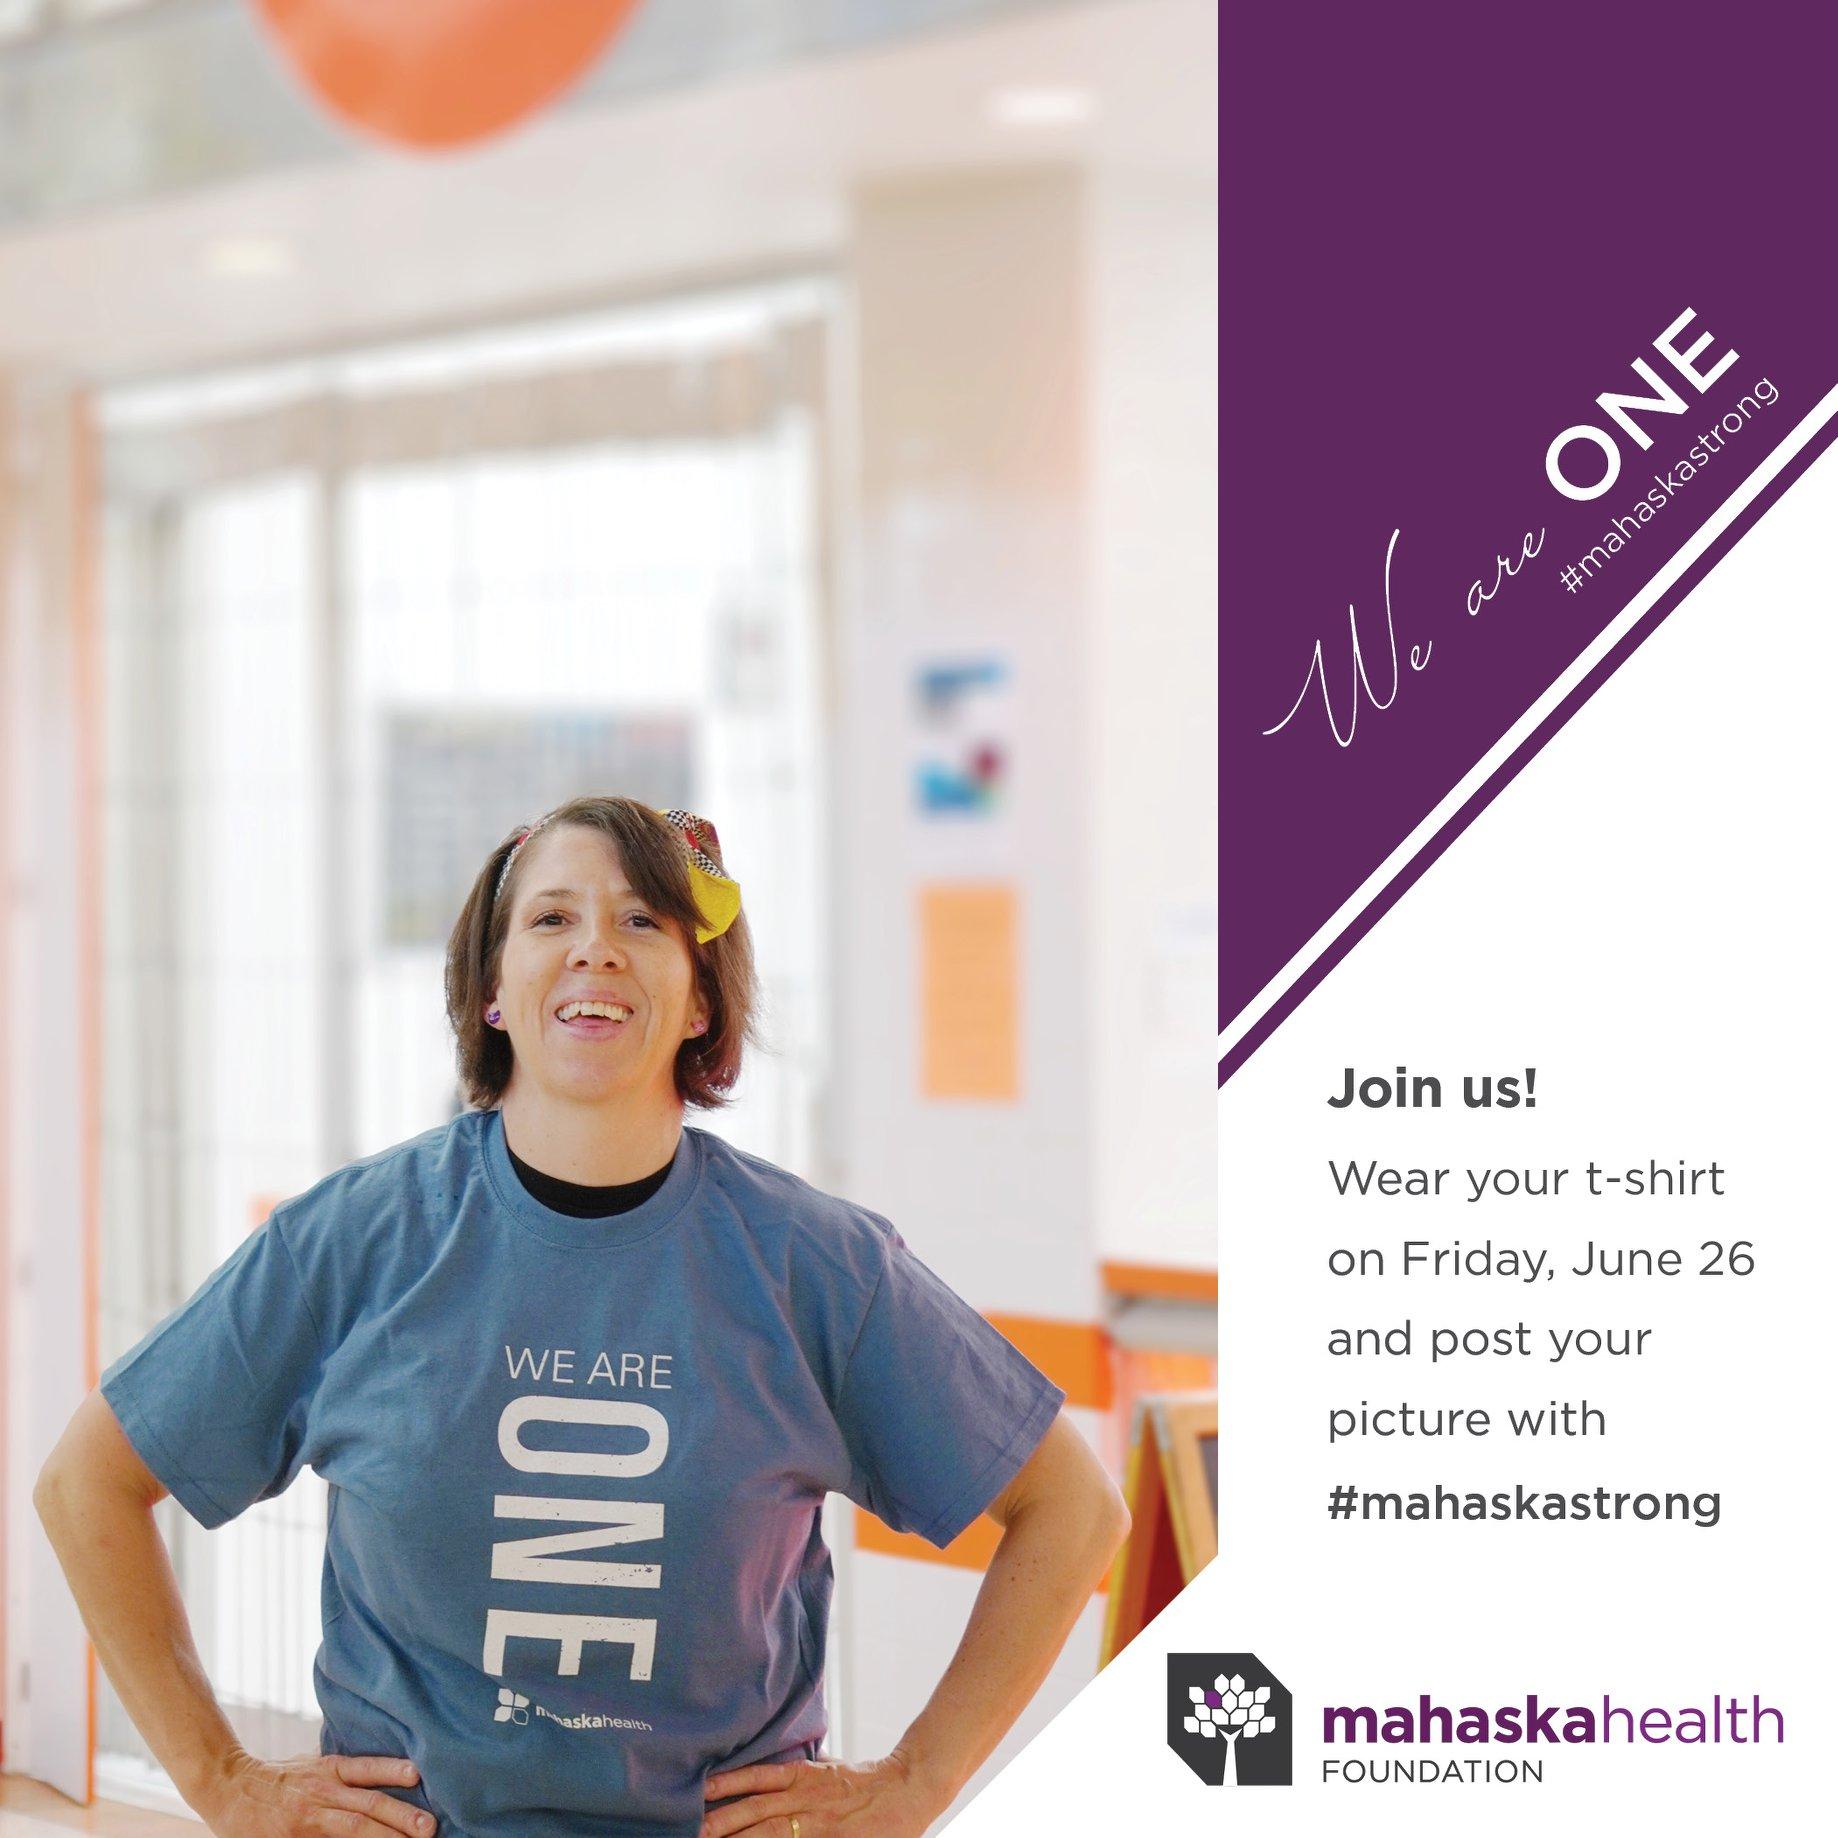 We Are One Mahaska Strong t-shirt